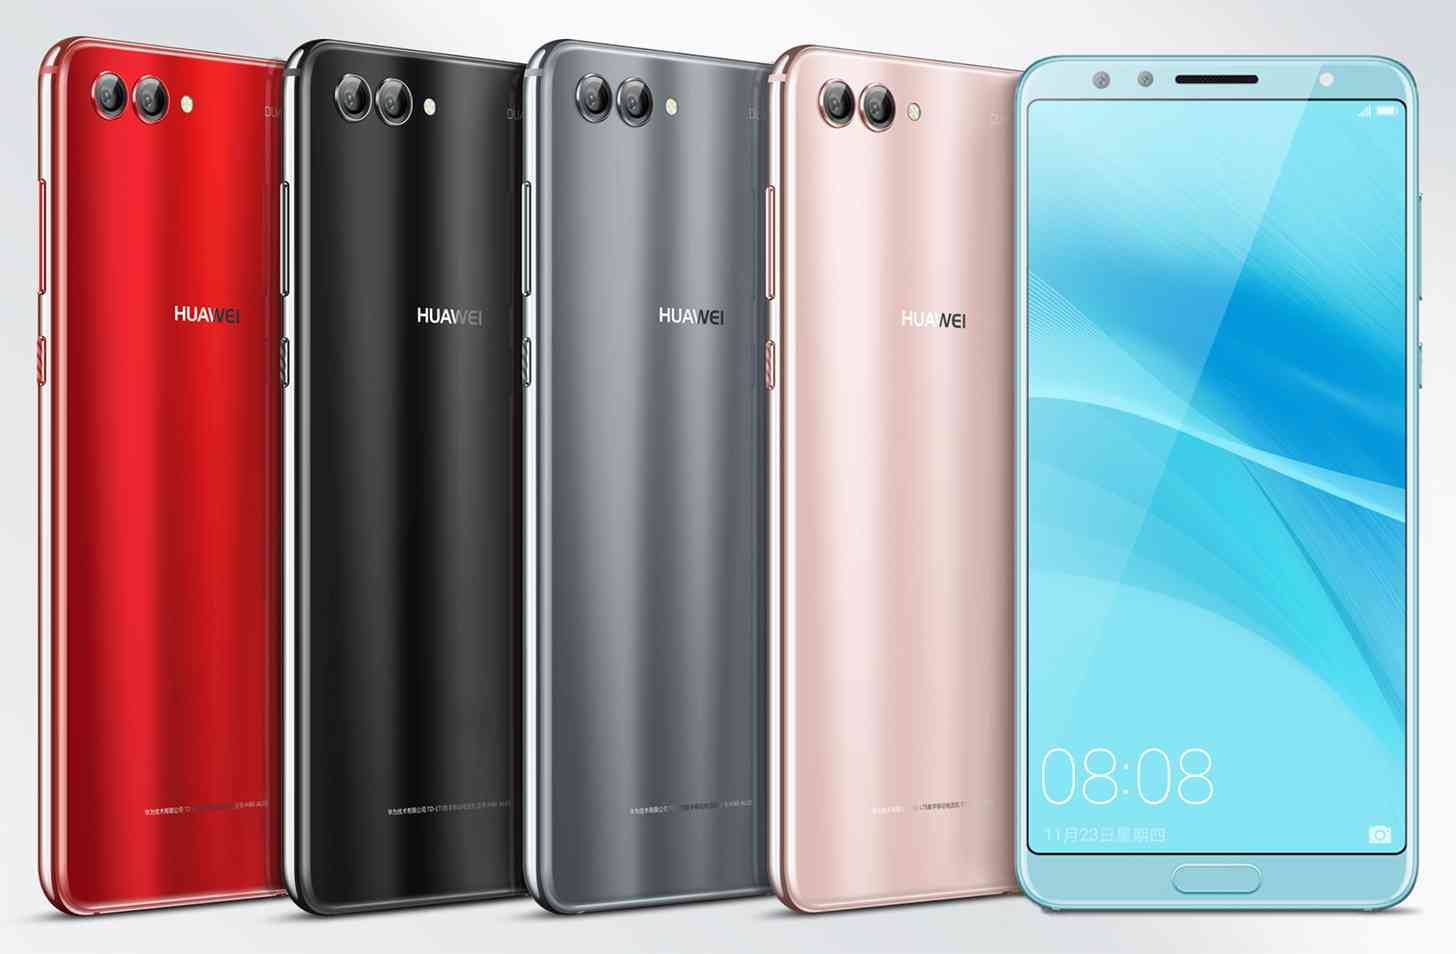 Huawei Nova 2s colors official